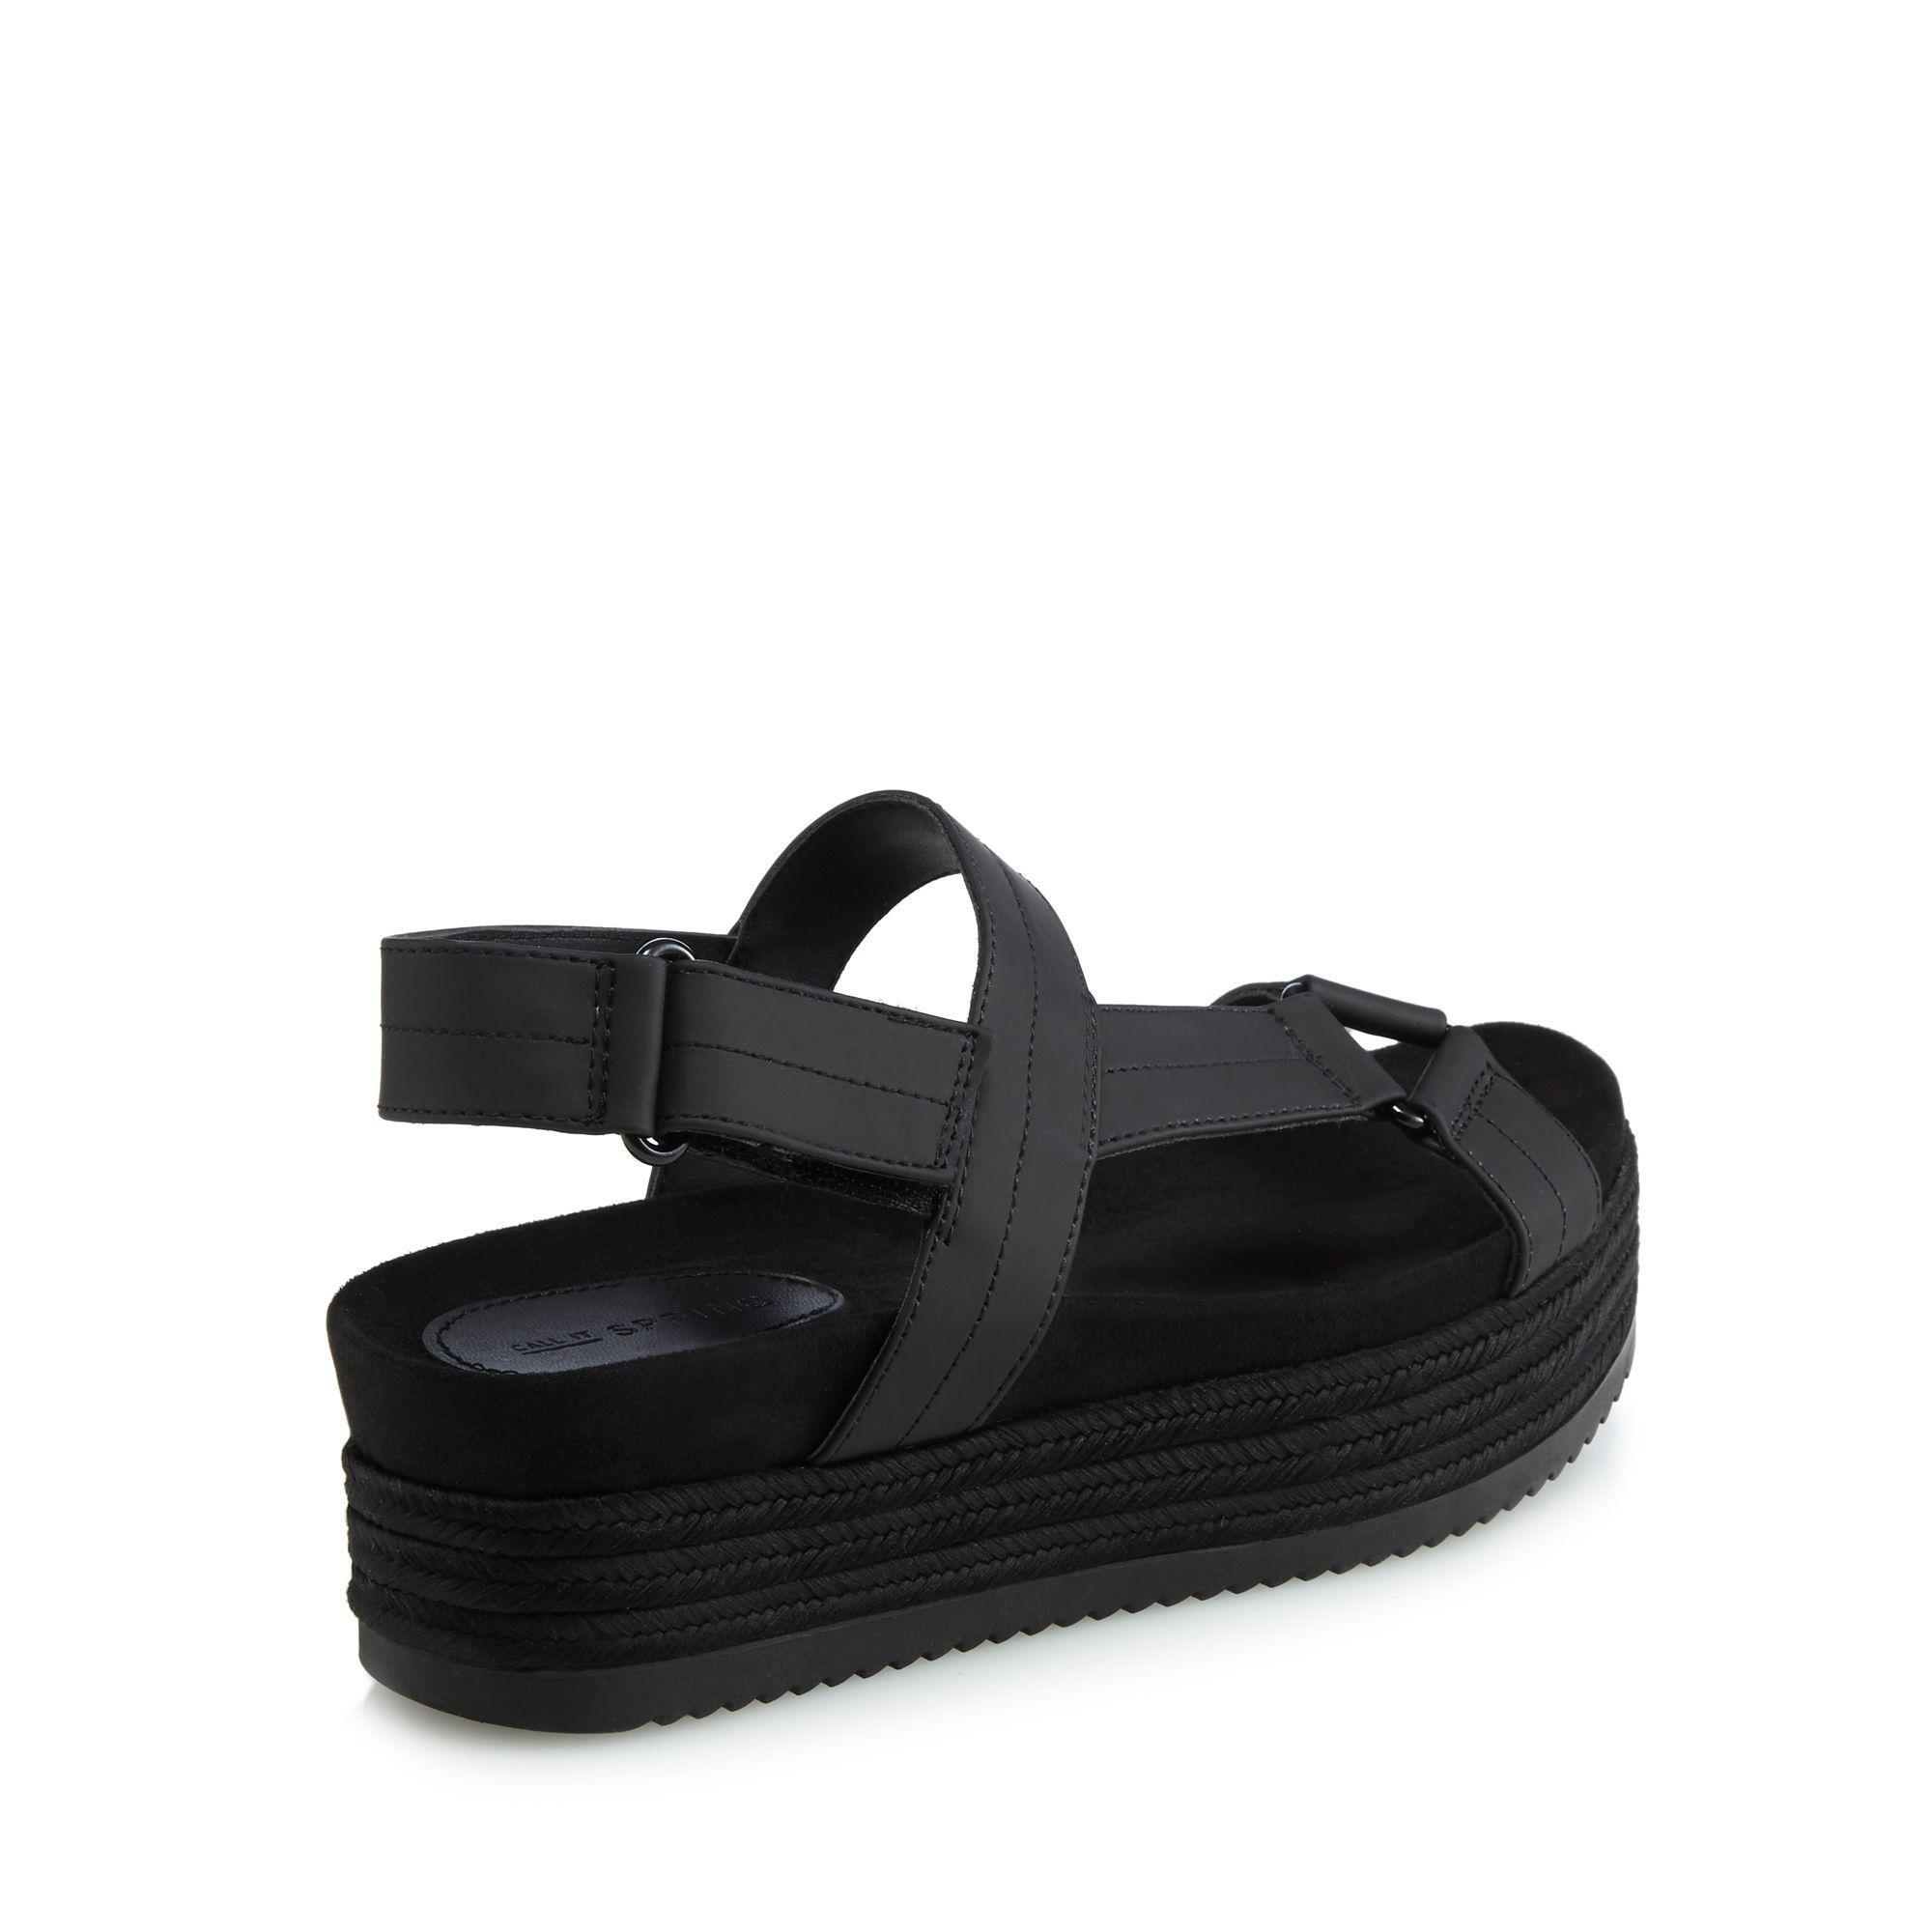 44e5a436528 Call It Spring Black  piresien  Mid Platform Heel Ankle Strap ...